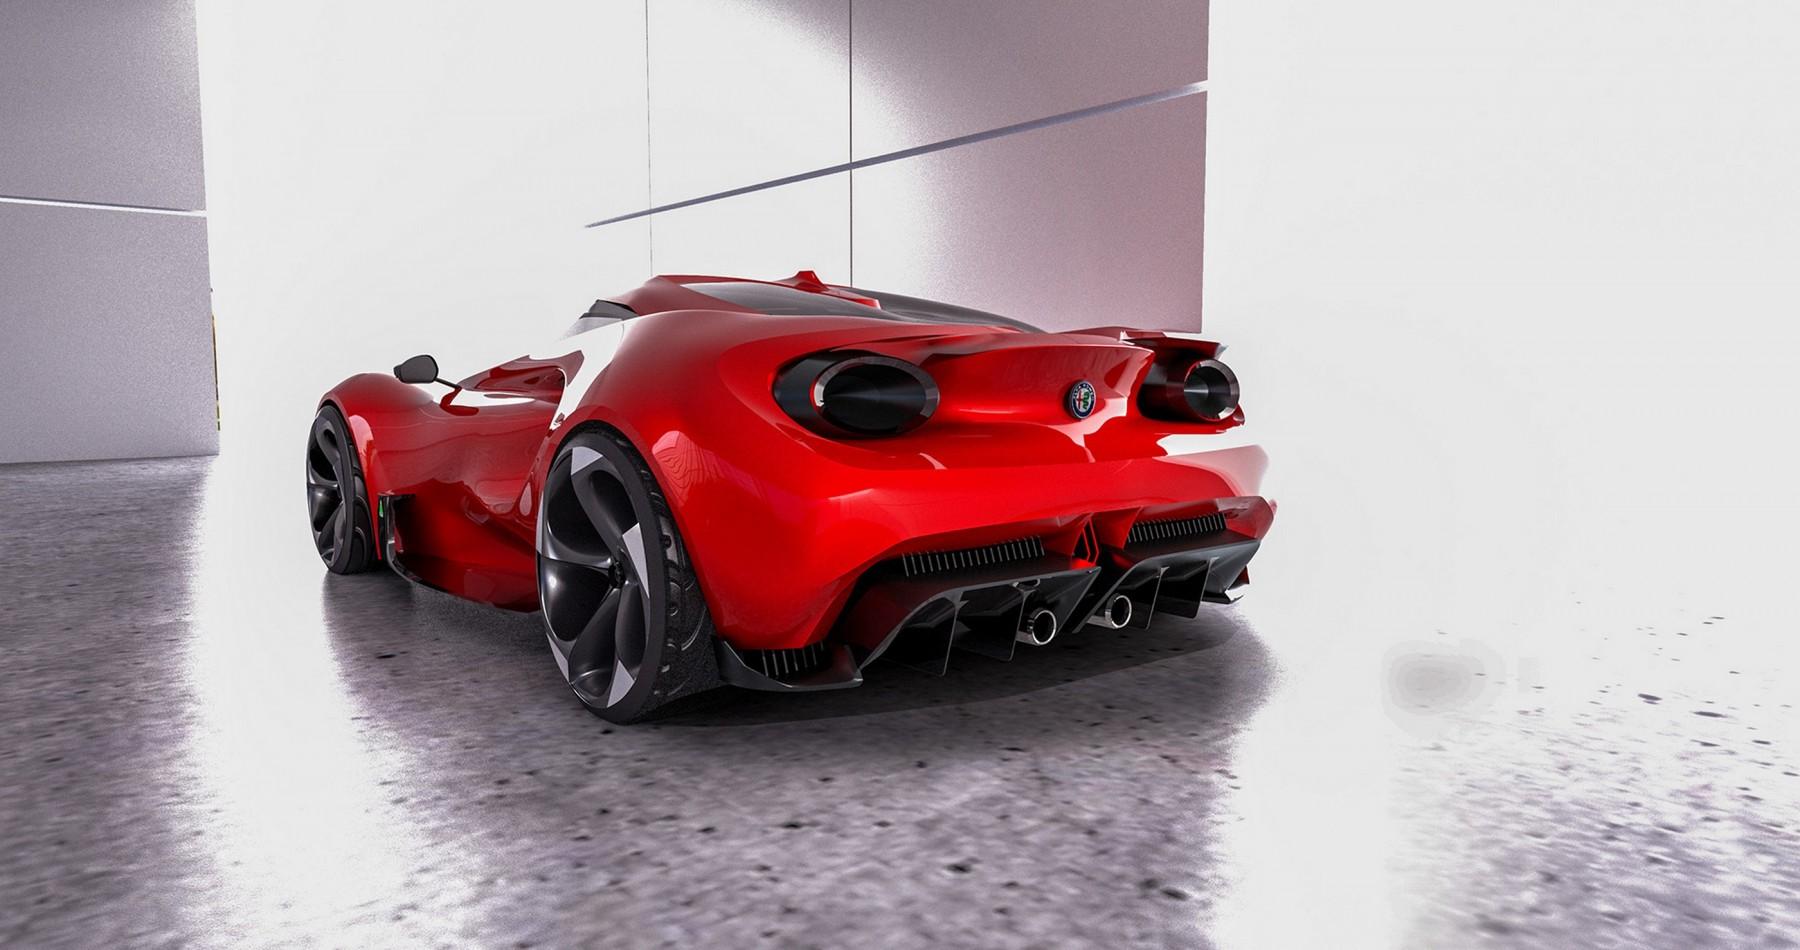 Alfa Romeo 4C 2020 by Yung Presciutti